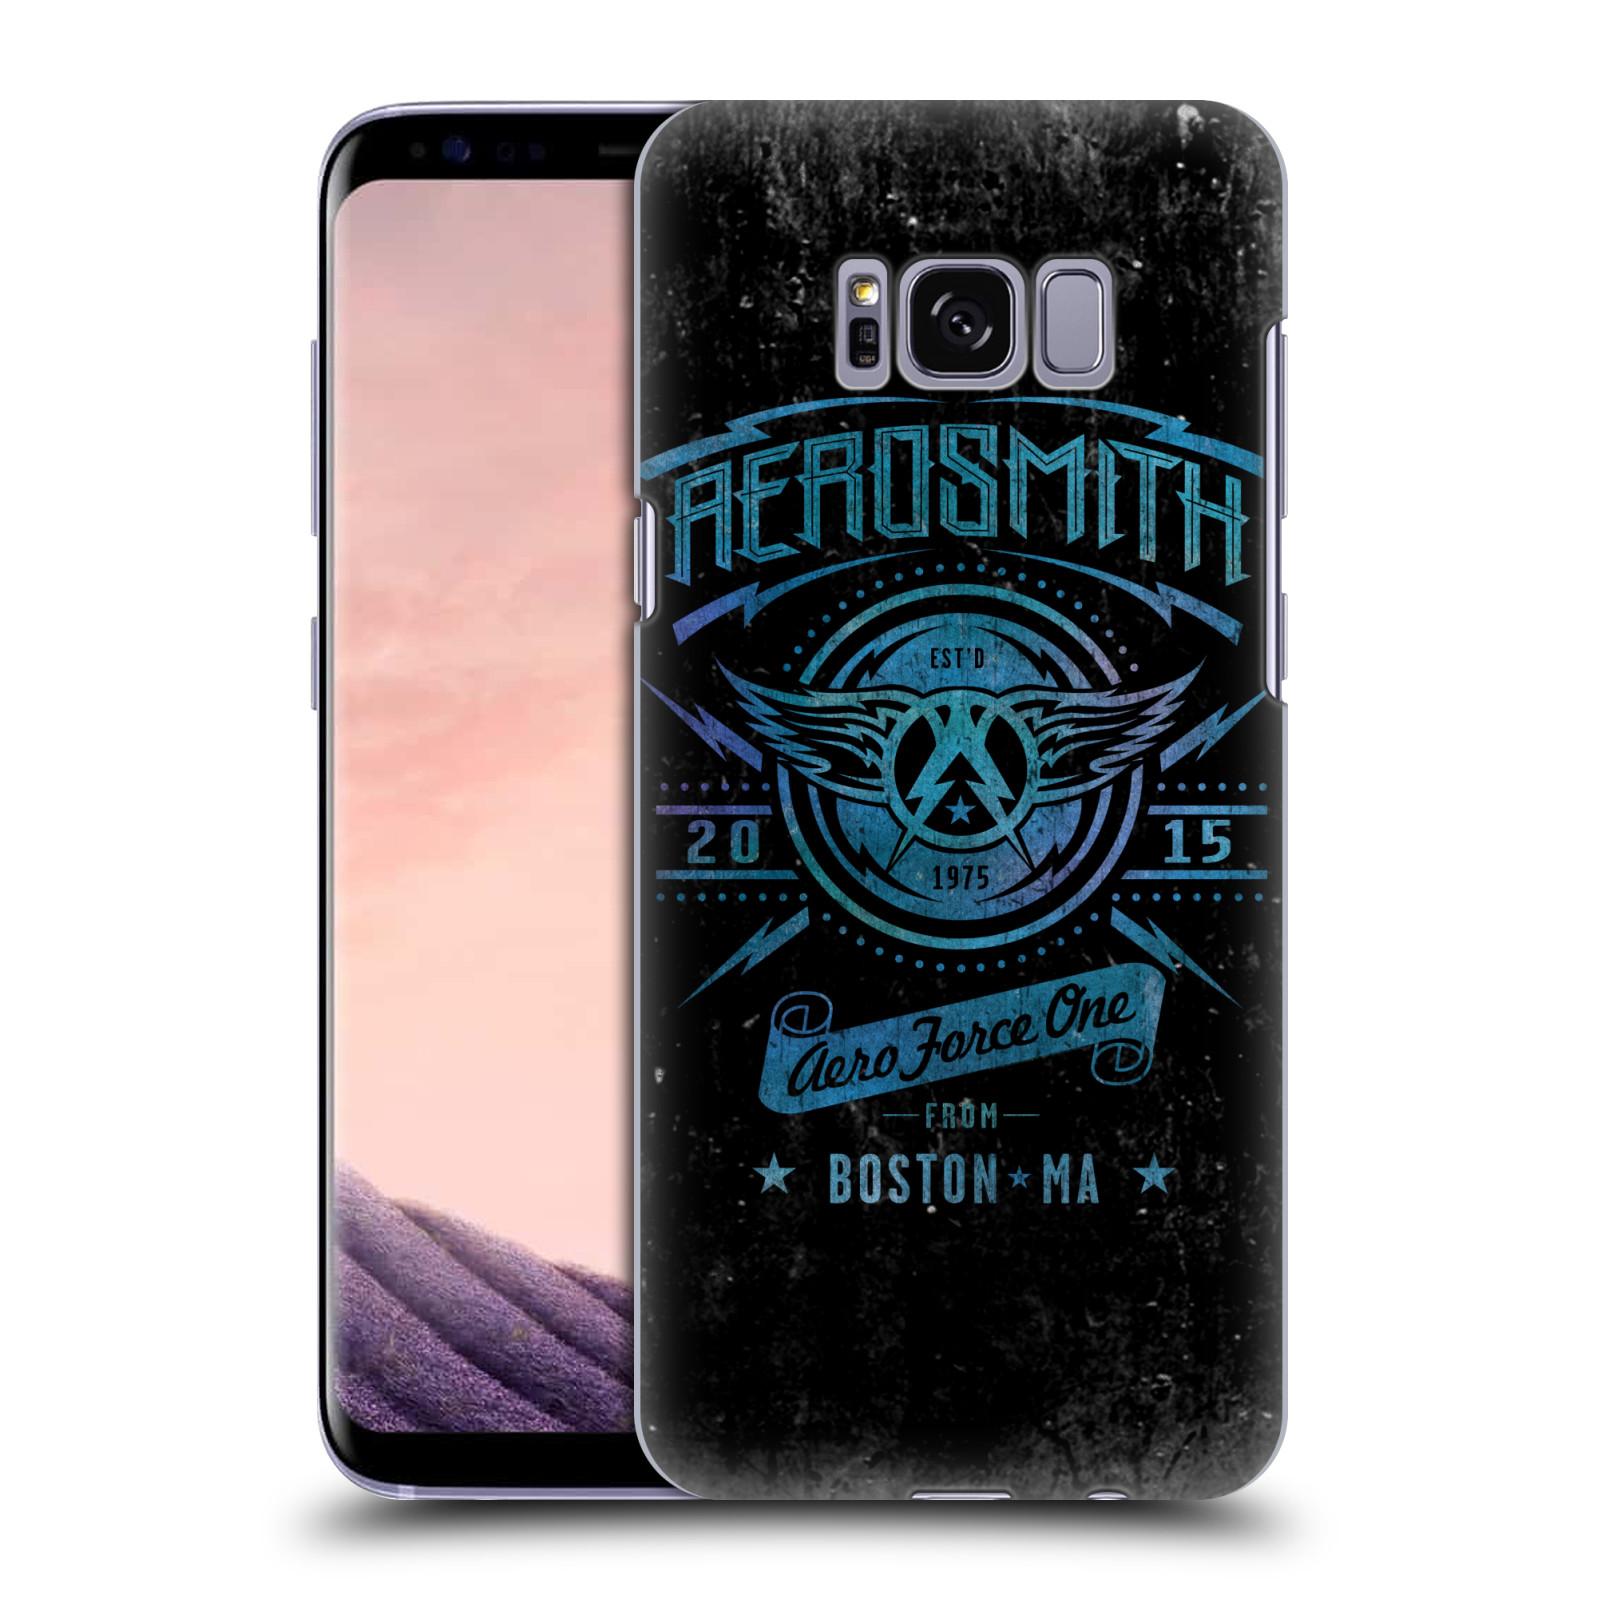 Plastové pouzdro na mobil Samsung Galaxy S8 Head Case - Aerosmith - Aero Force One